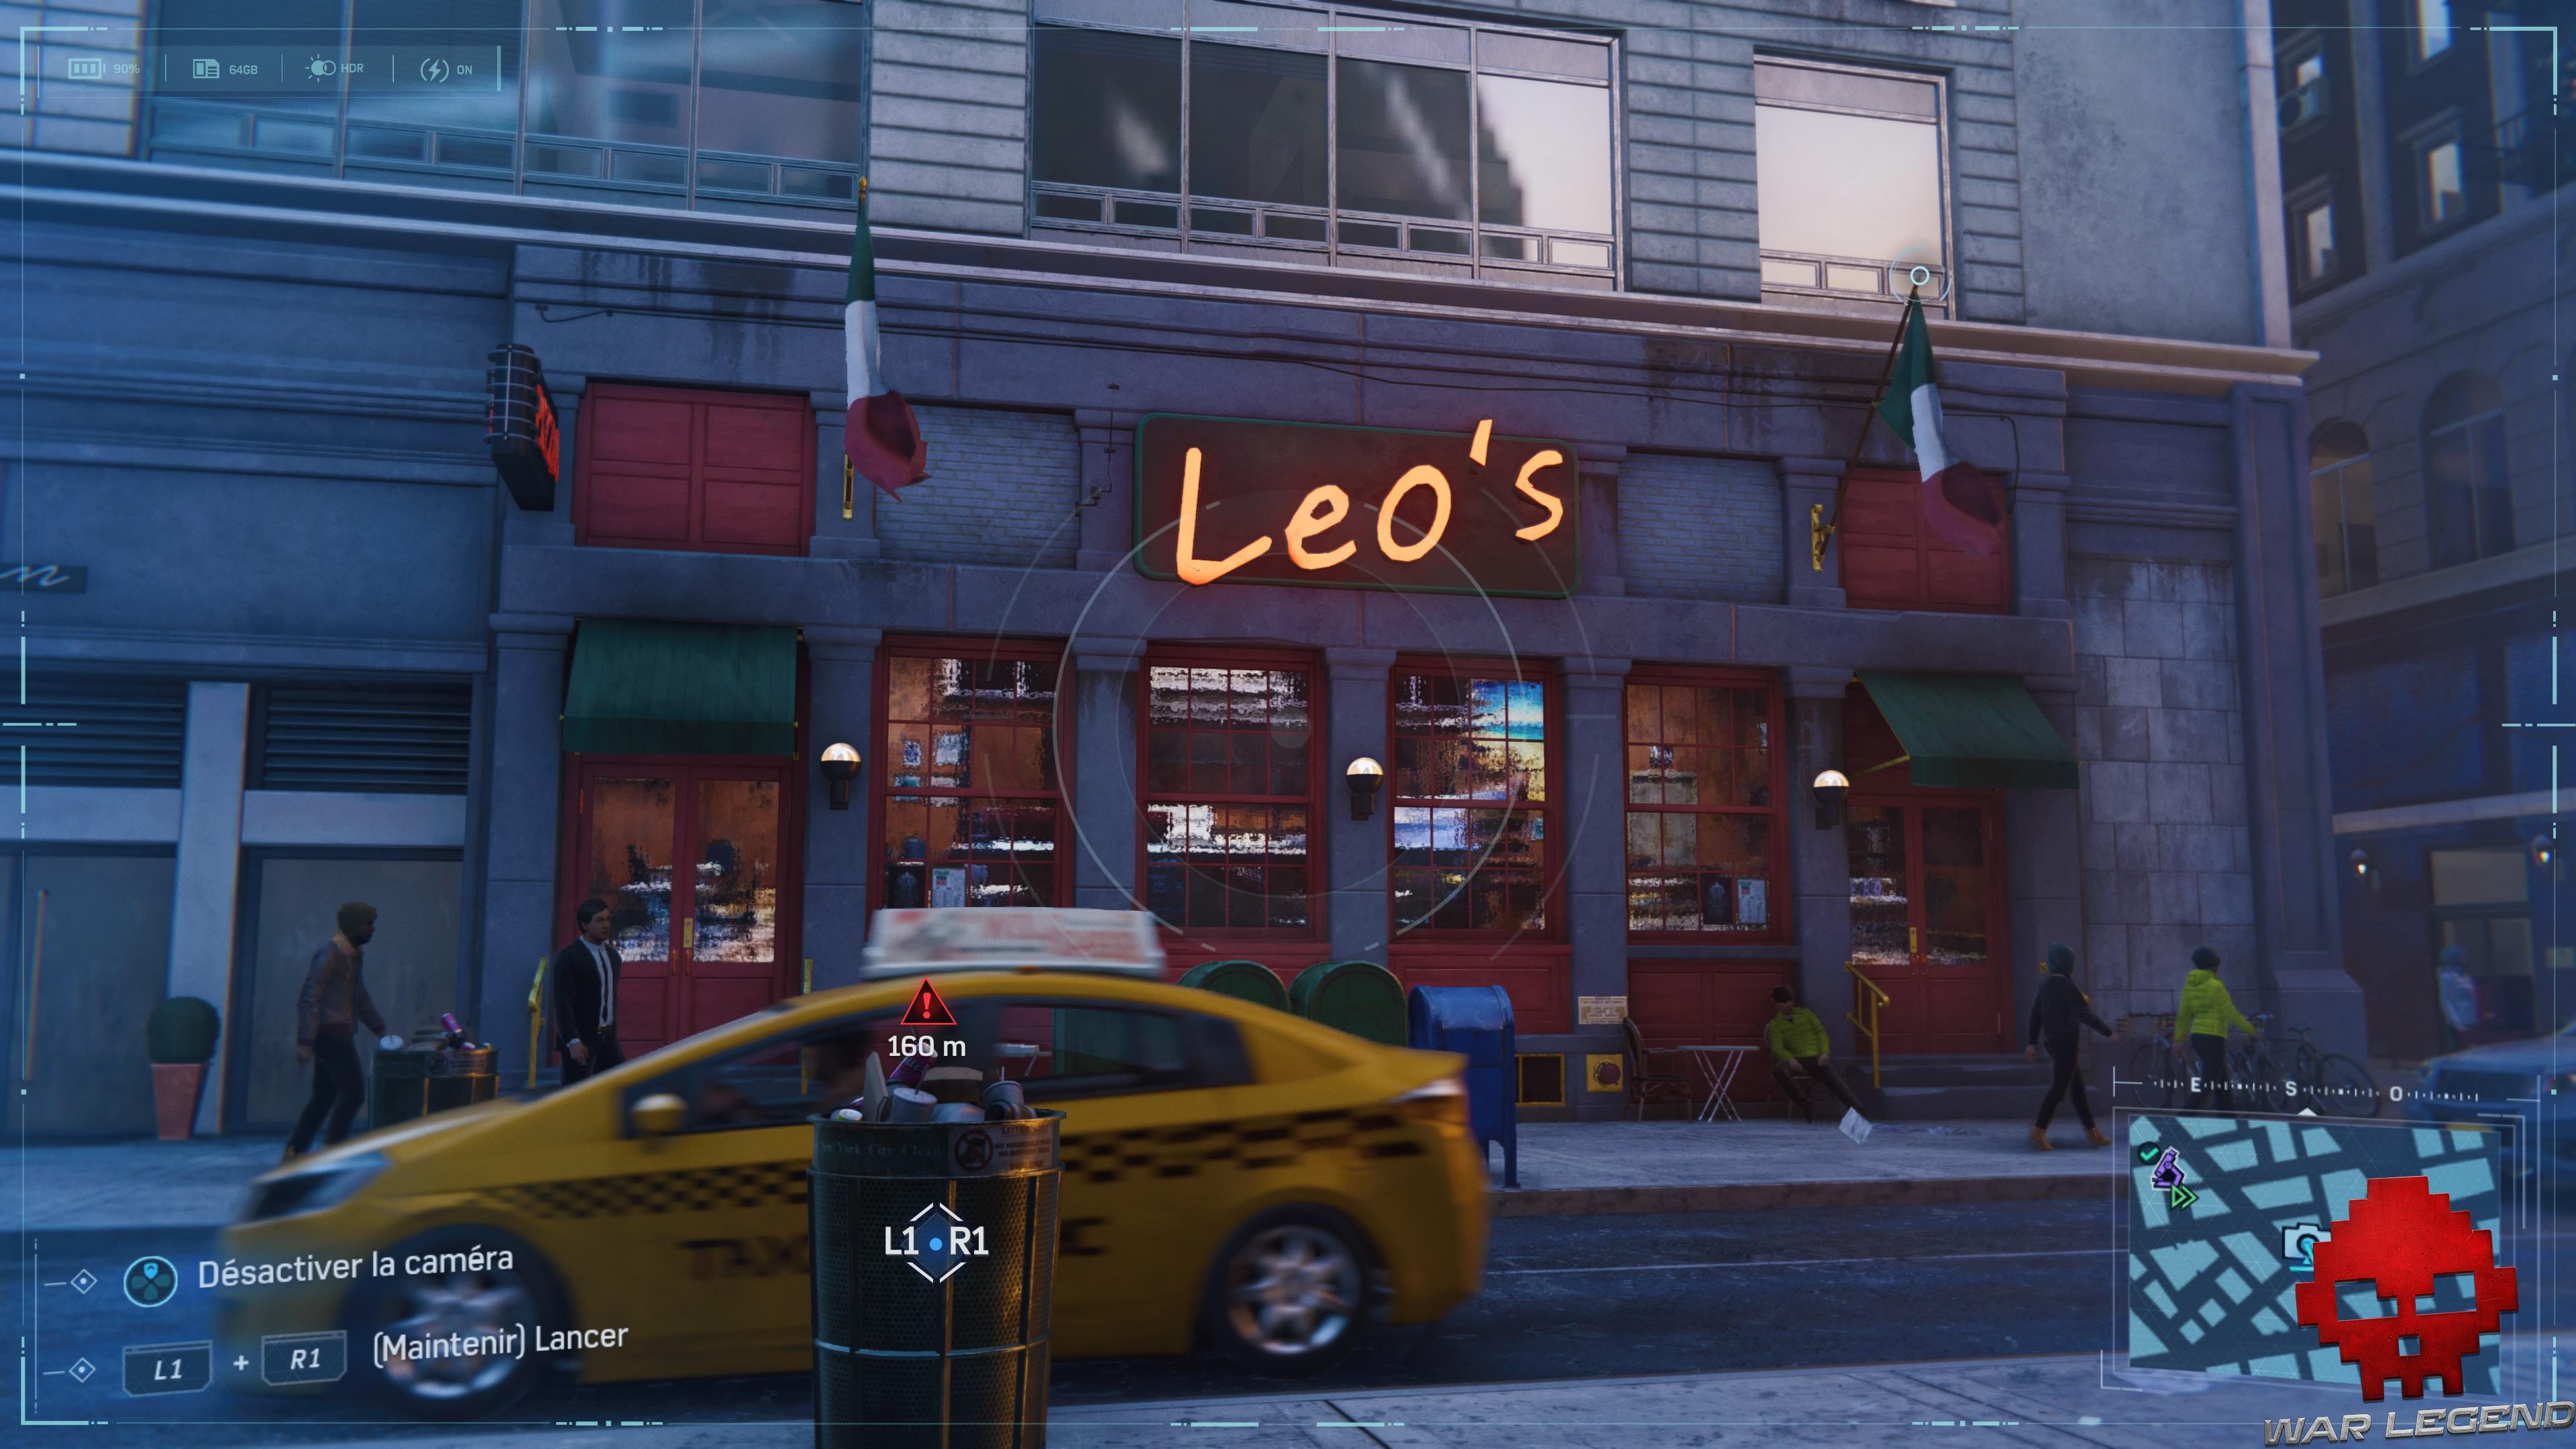 Spider-Man photo secrète Pizzeria Leo's